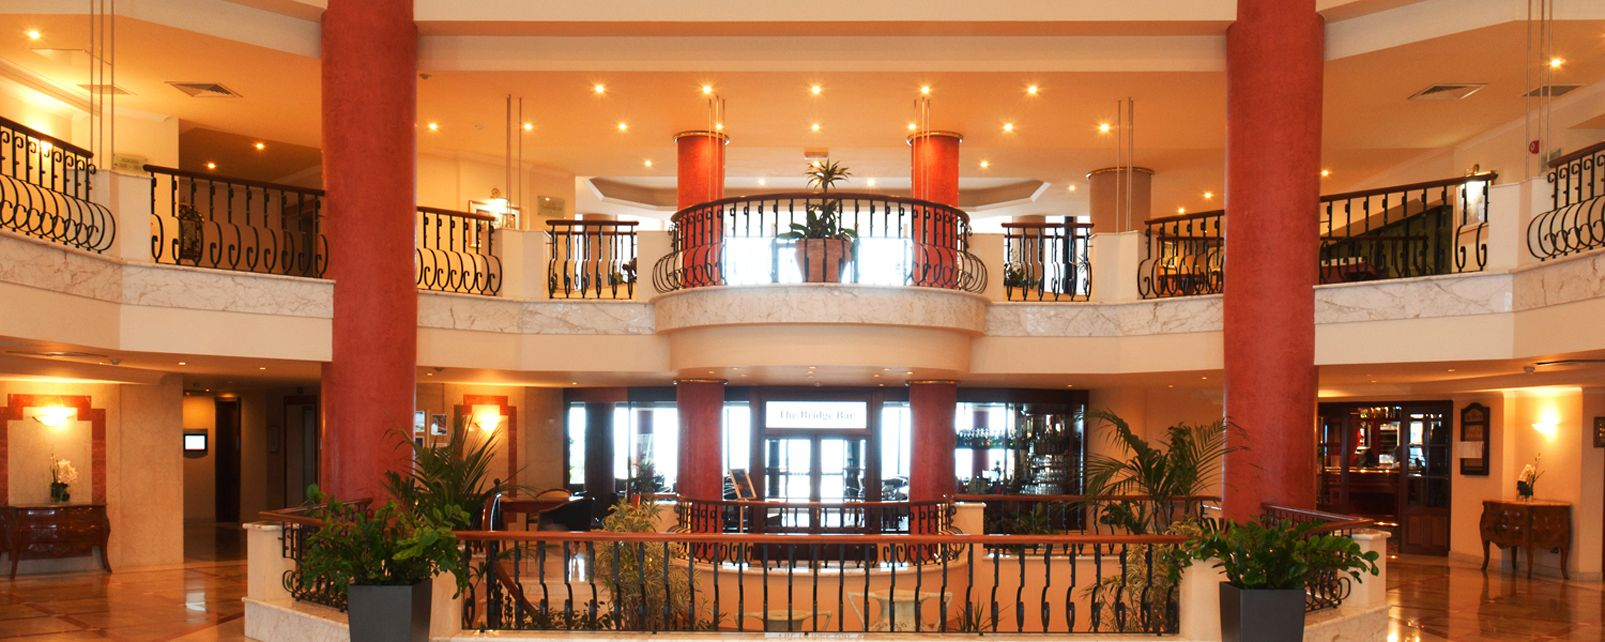 Hôtel Radisson Sas Bay Point Resort